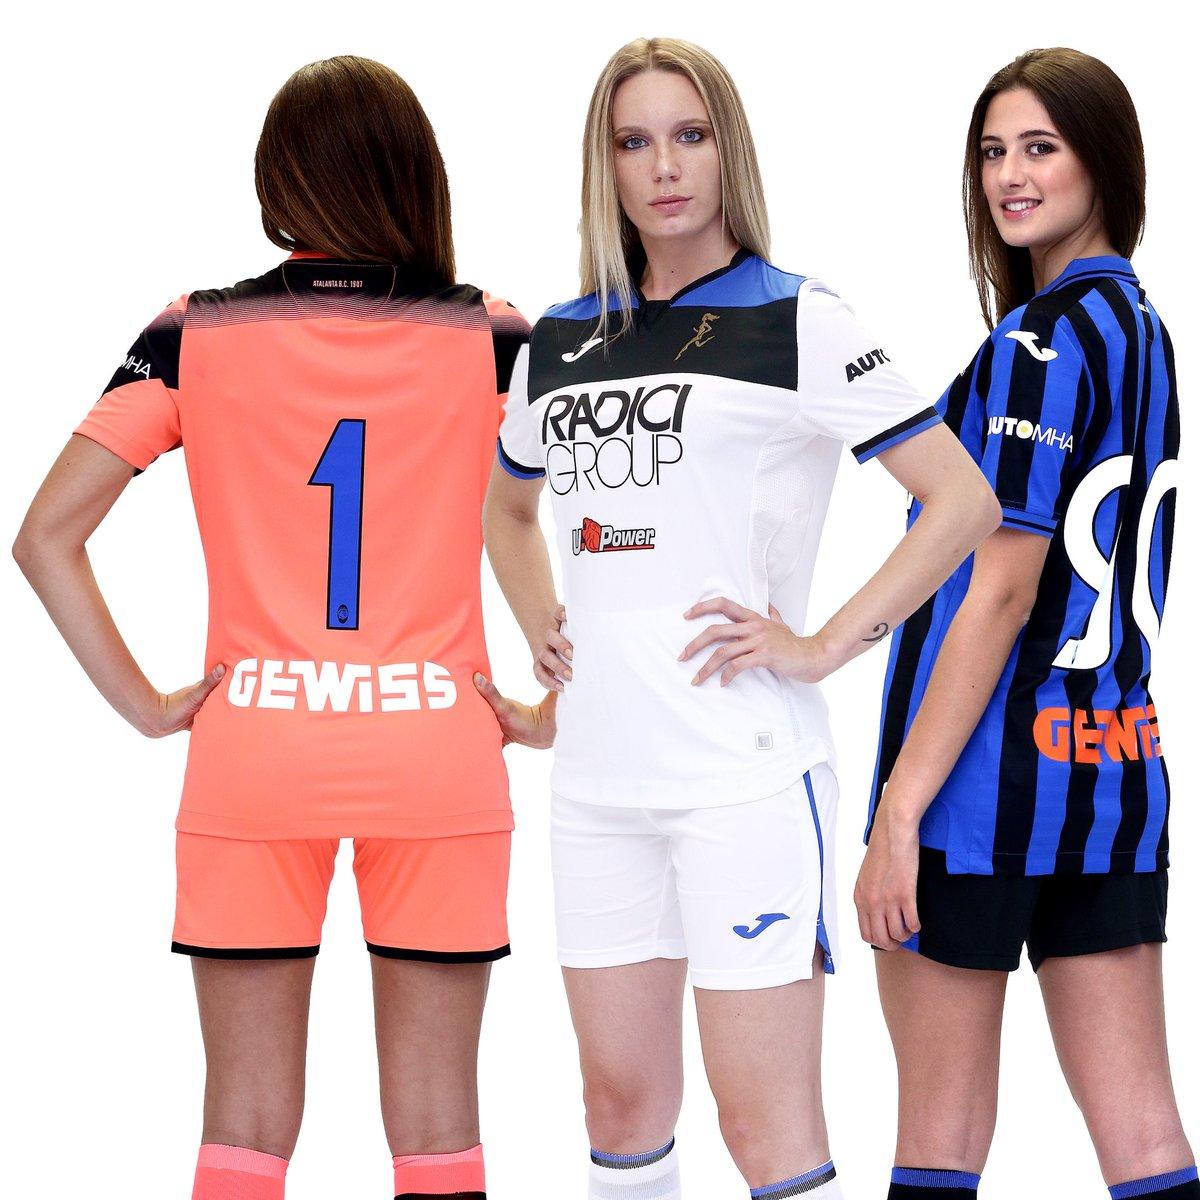 Atalanta 2019/20 Joma Home and Away Kits - FOOTBALL FASHION